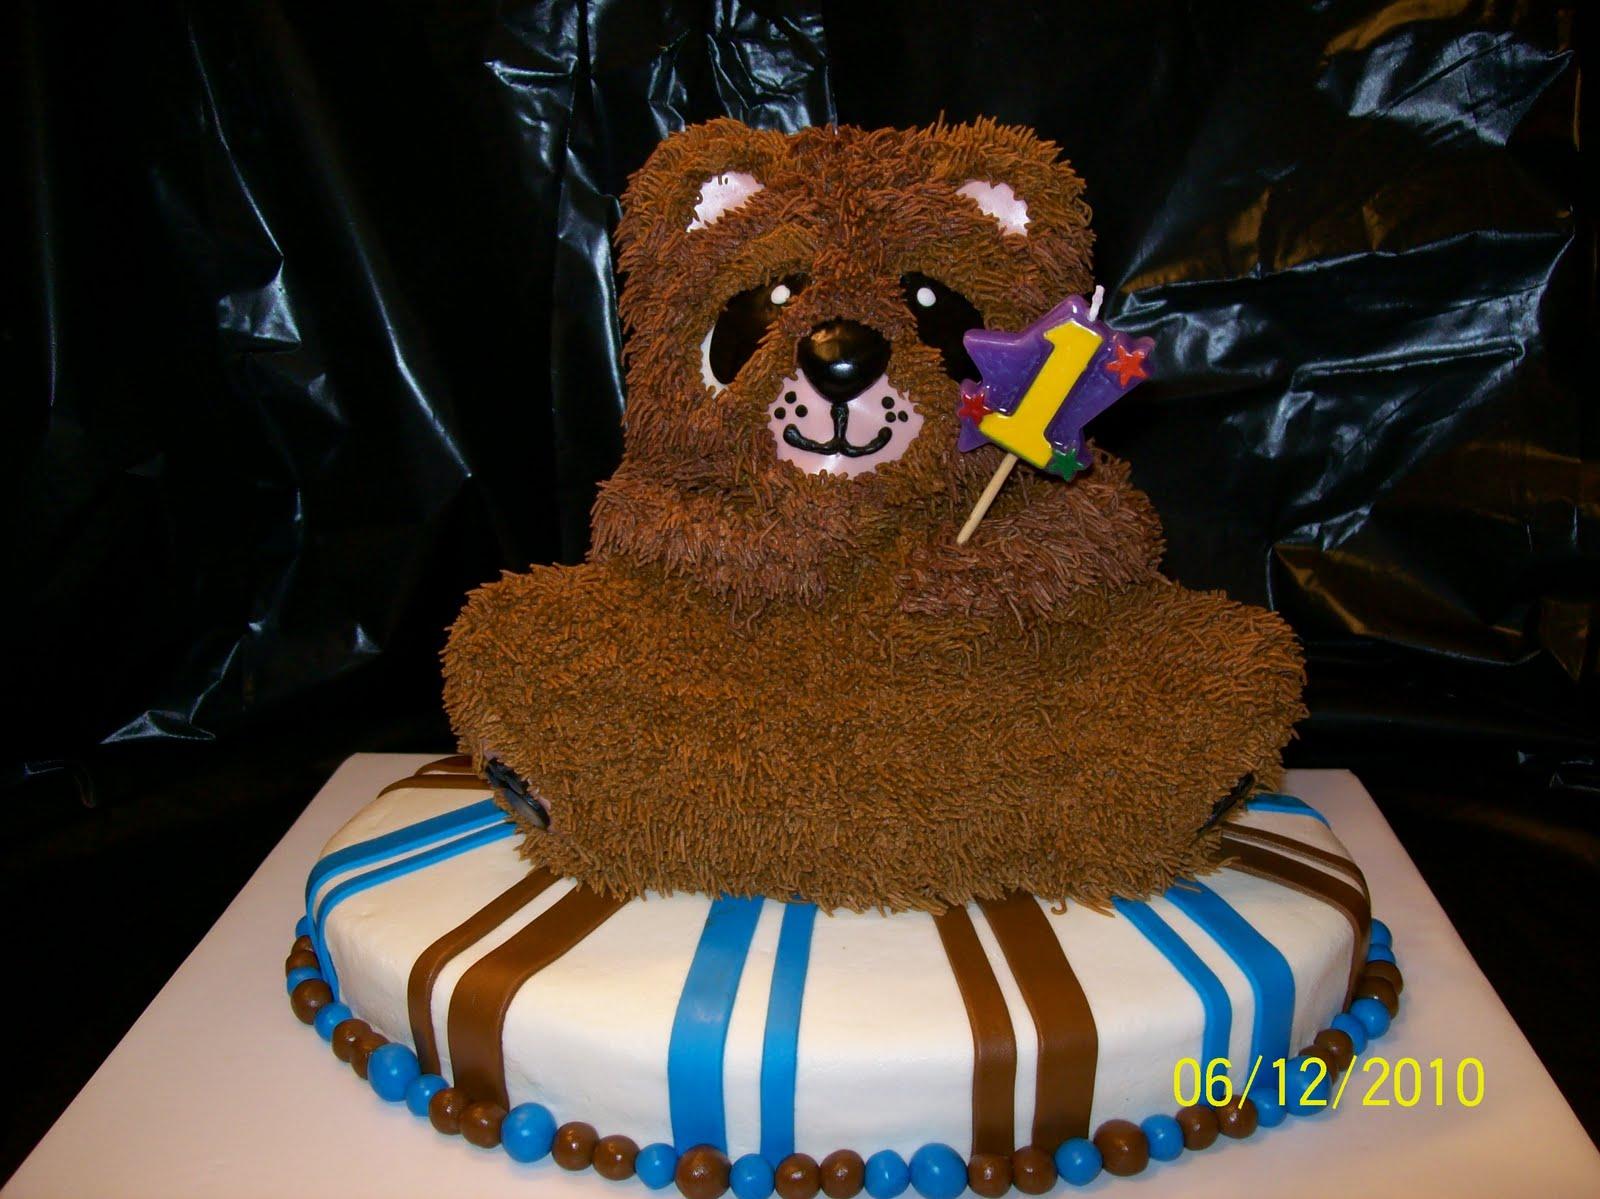 http://3.bp.blogspot.com/_vHk7H9PJu_M/TBZCMWyxP5I/AAAAAAAAAWA/MA2tS2SYz3s/s1600/Teddy%2BBear.jpg